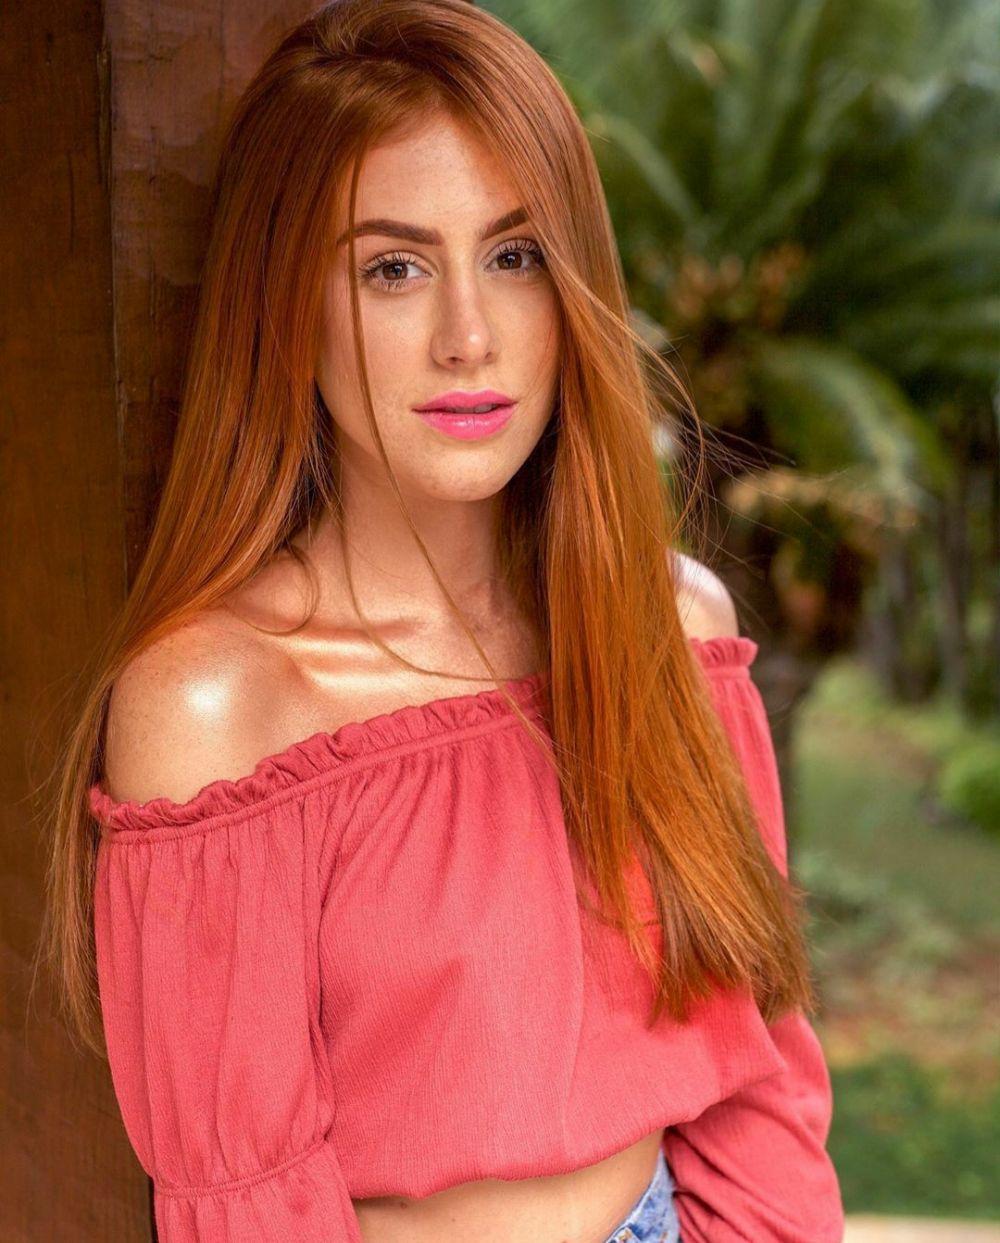 Dinilai Mirip Regina Idol, 10 Potret Beauty Vlogger Dunia Mari Maria